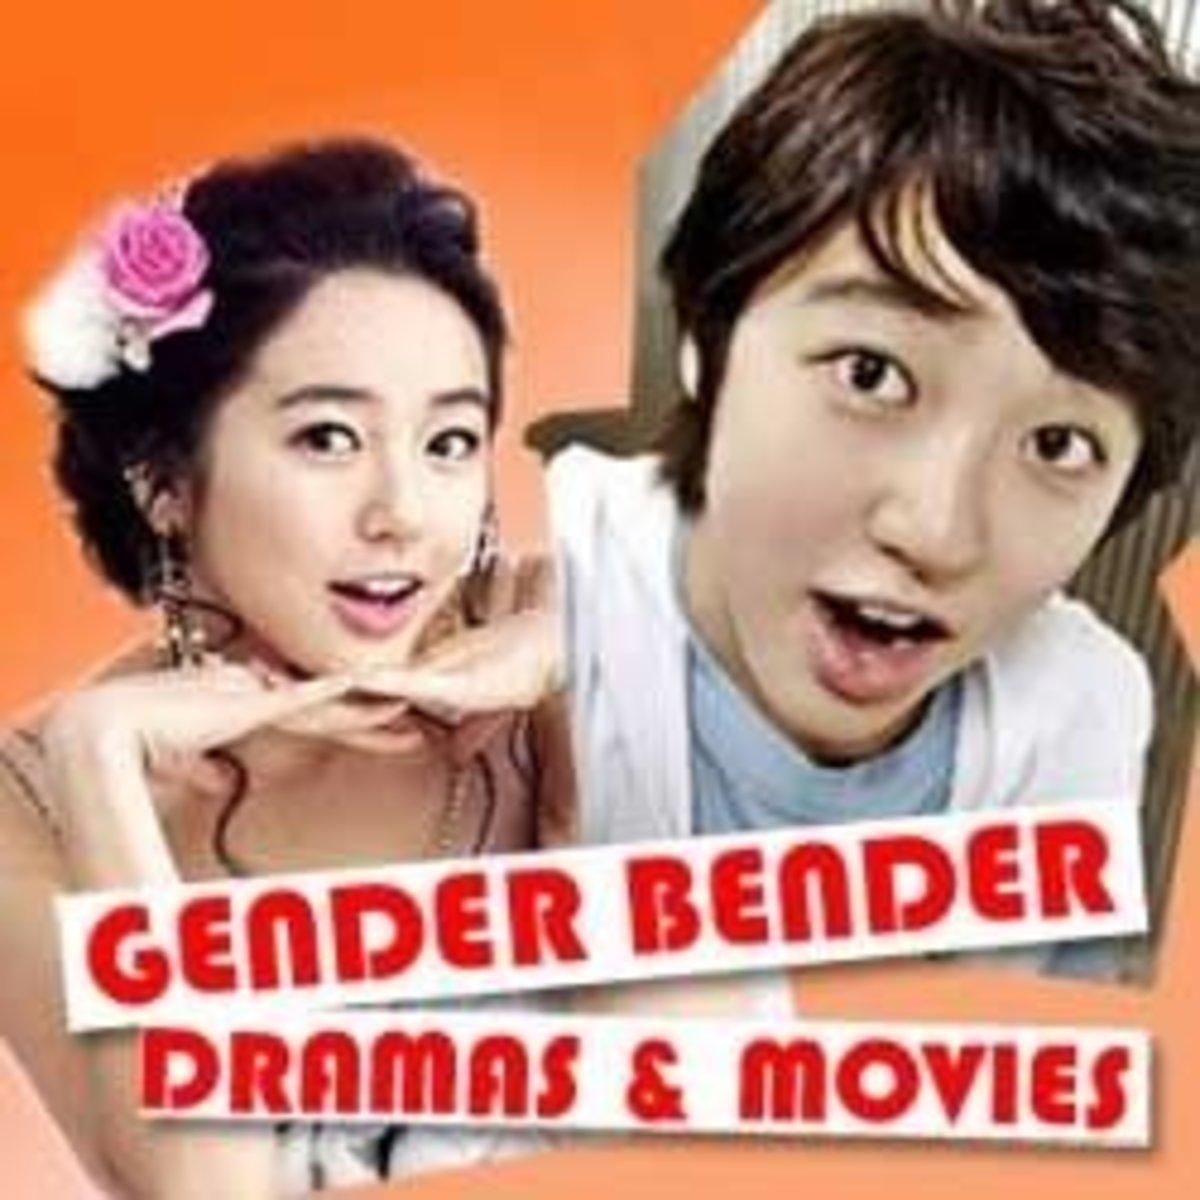 Gender Bender Asian Dramas and Movies